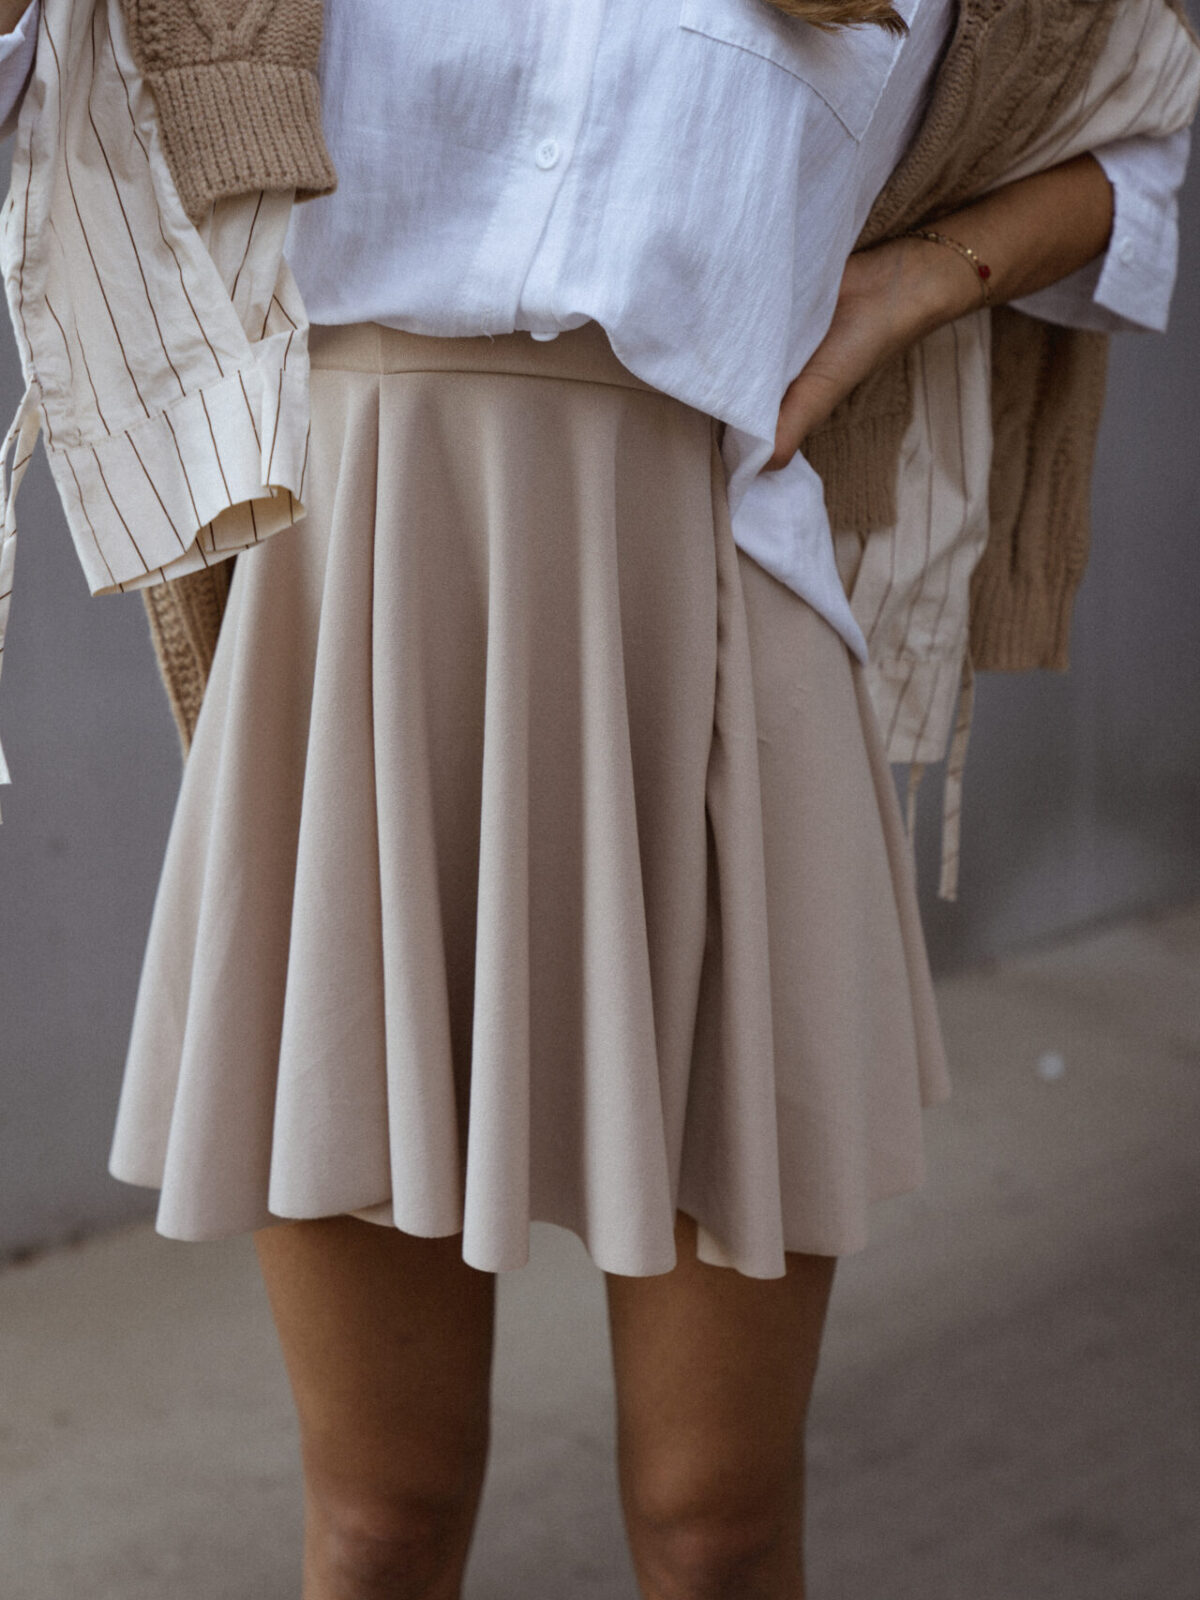 jupe-patineuse-beige-pull-beige-chemise-femme-gisette-store (42)